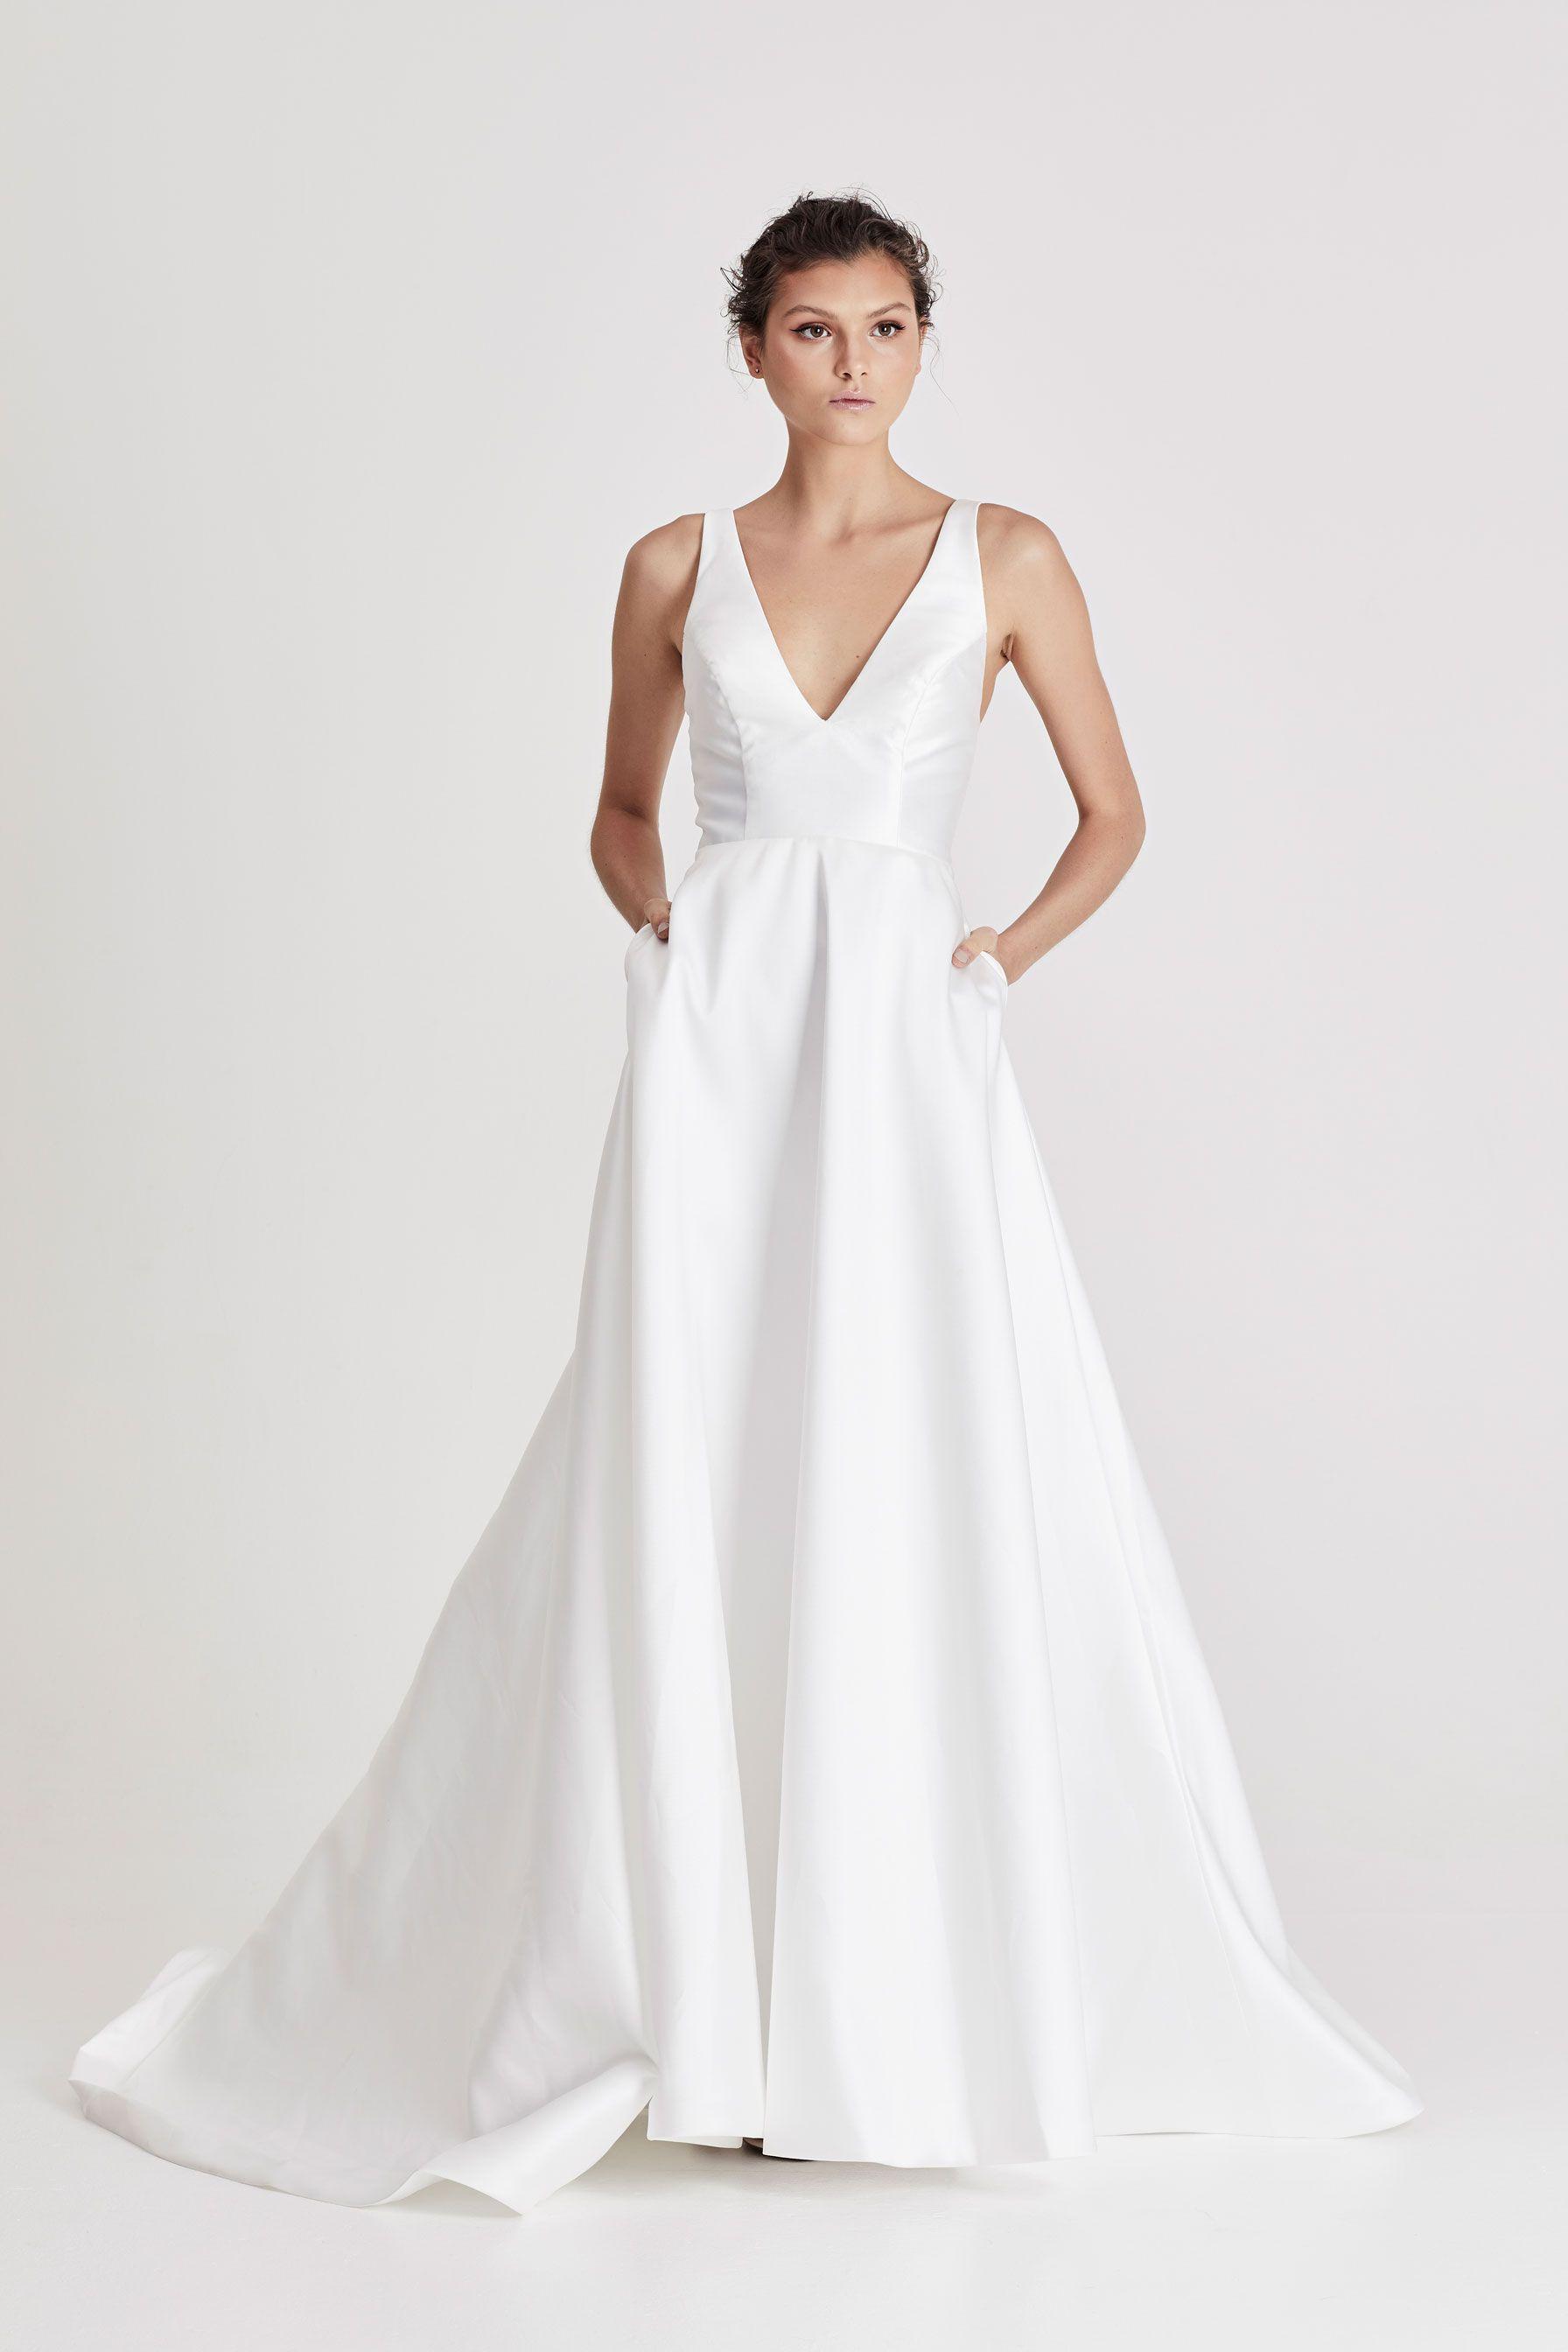 Hart one day bridal usa wedding dresses bridal